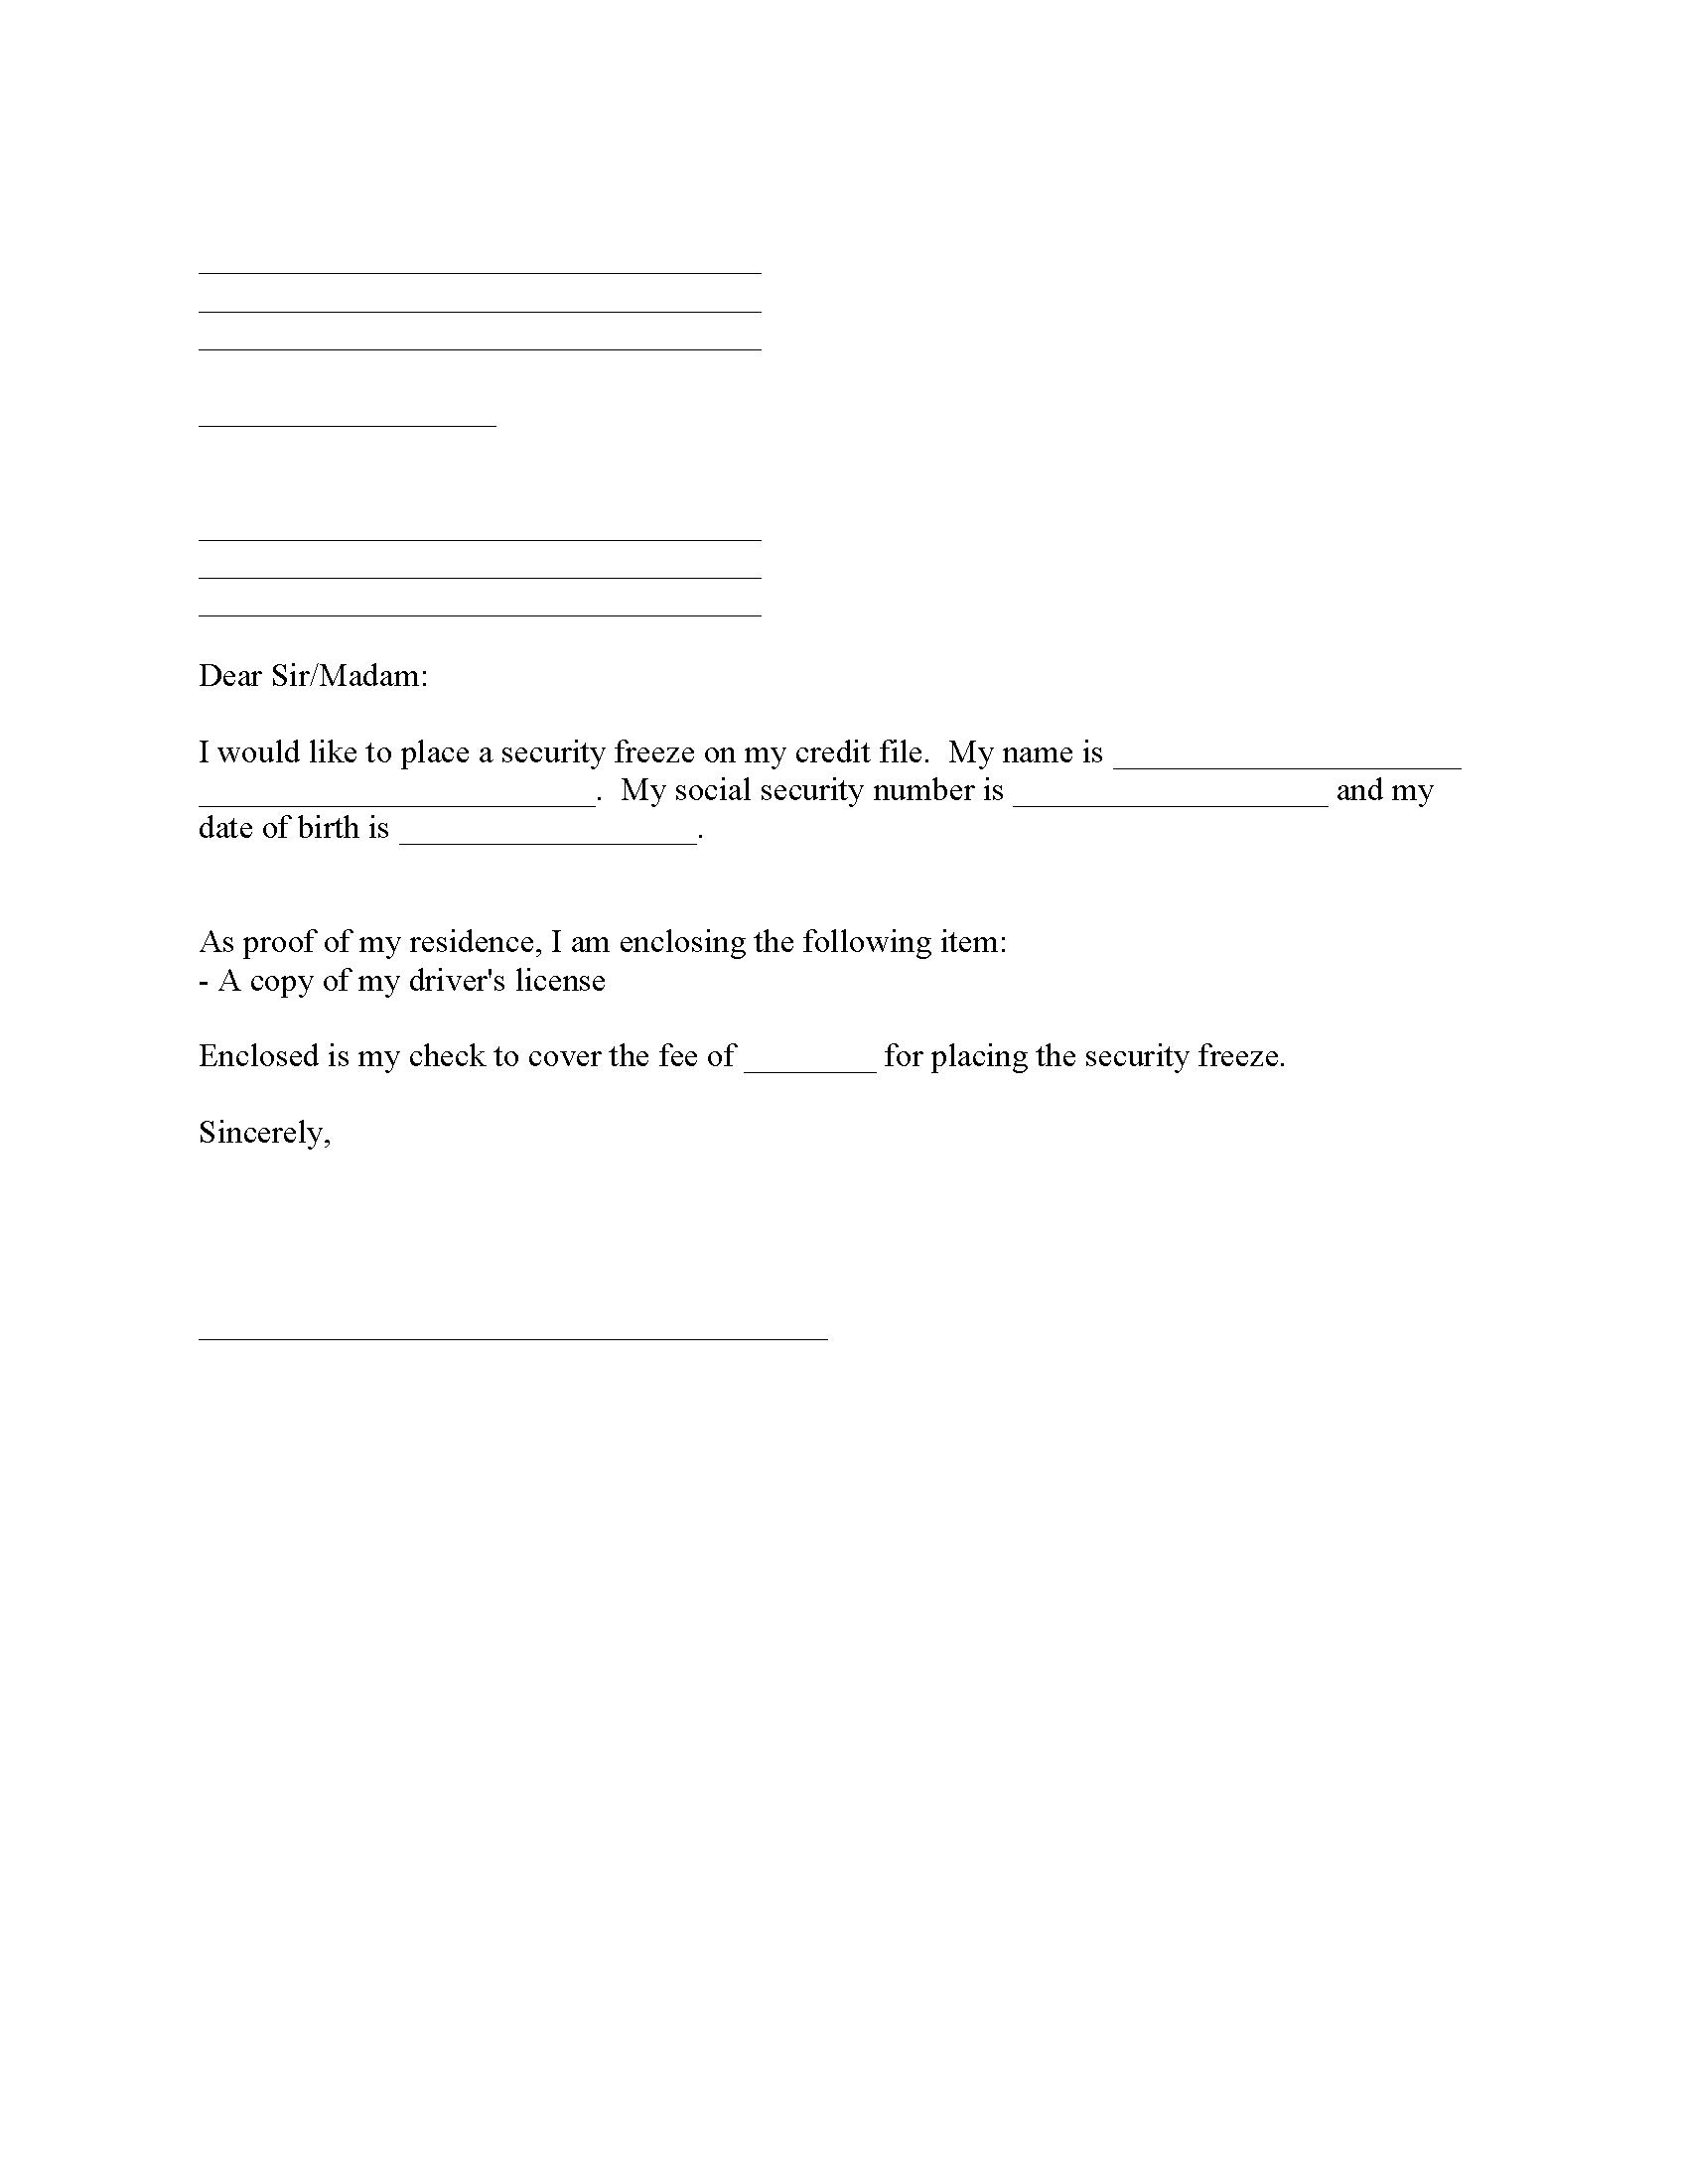 Credit Freeze Request Form